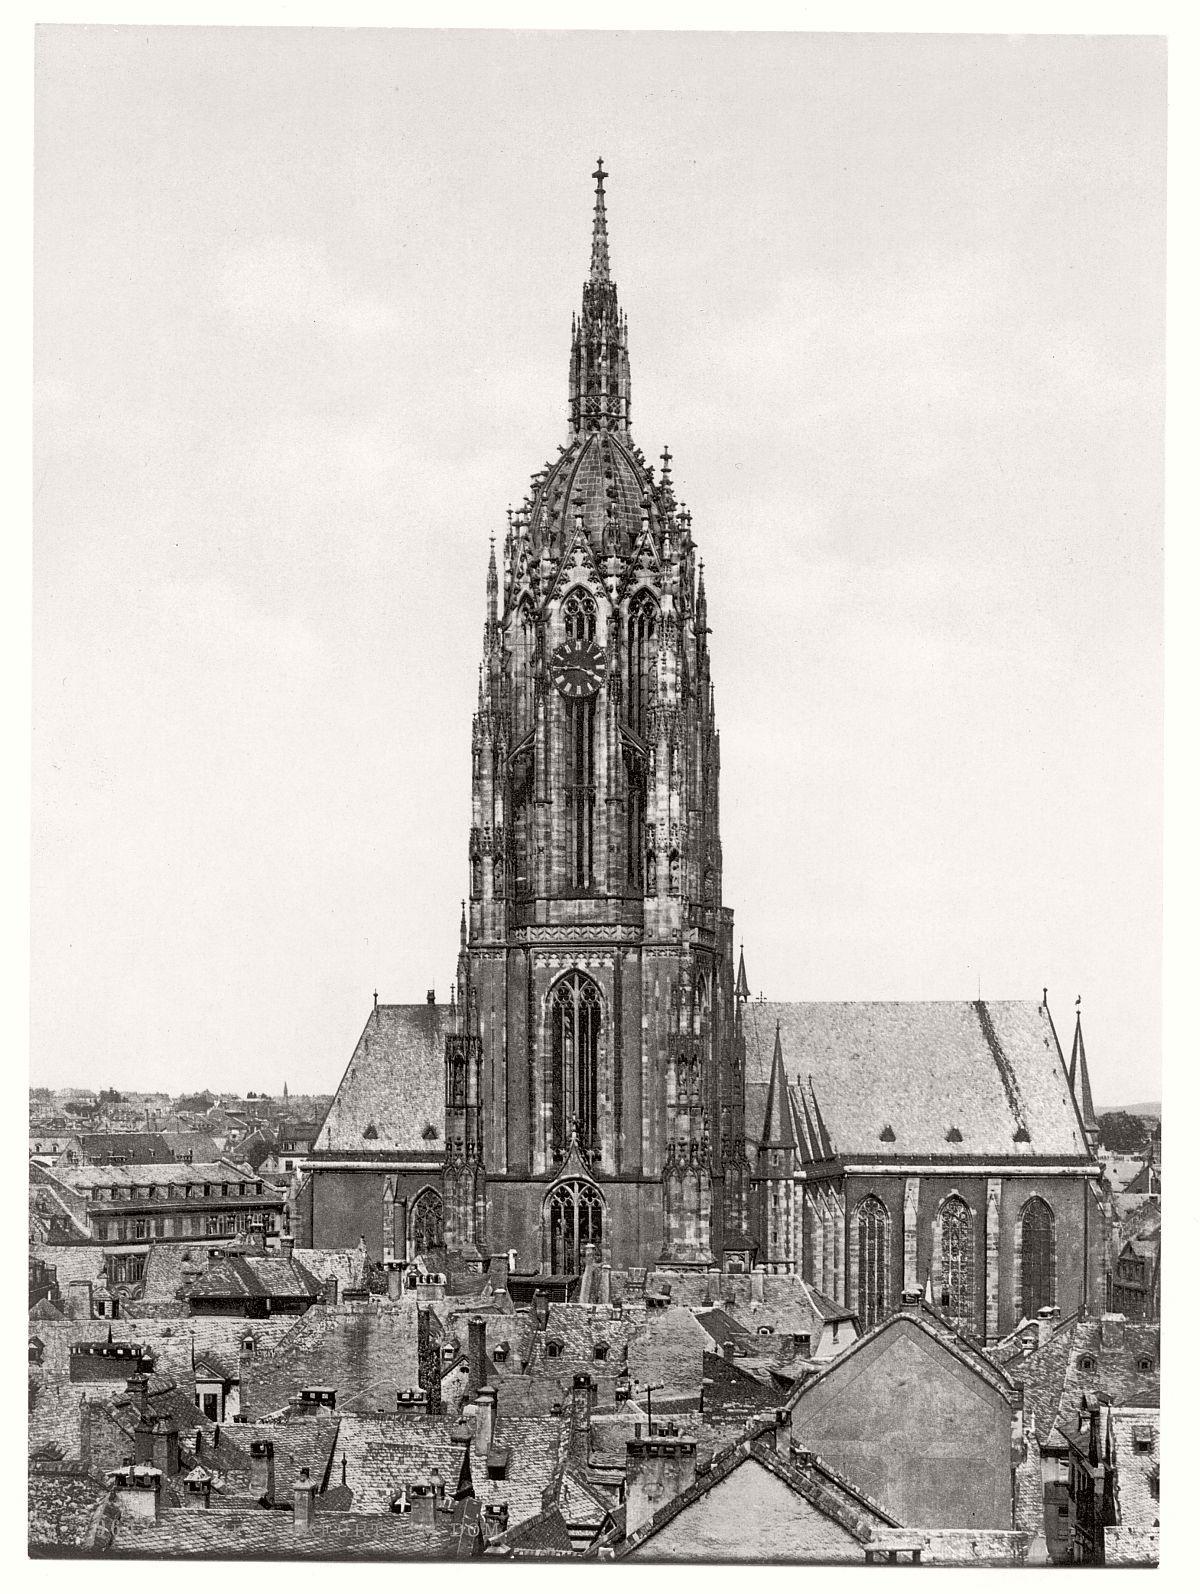 vintage-historic-photos-of-frankfurt-am-main-germany-circa-1890s-19th-century-05